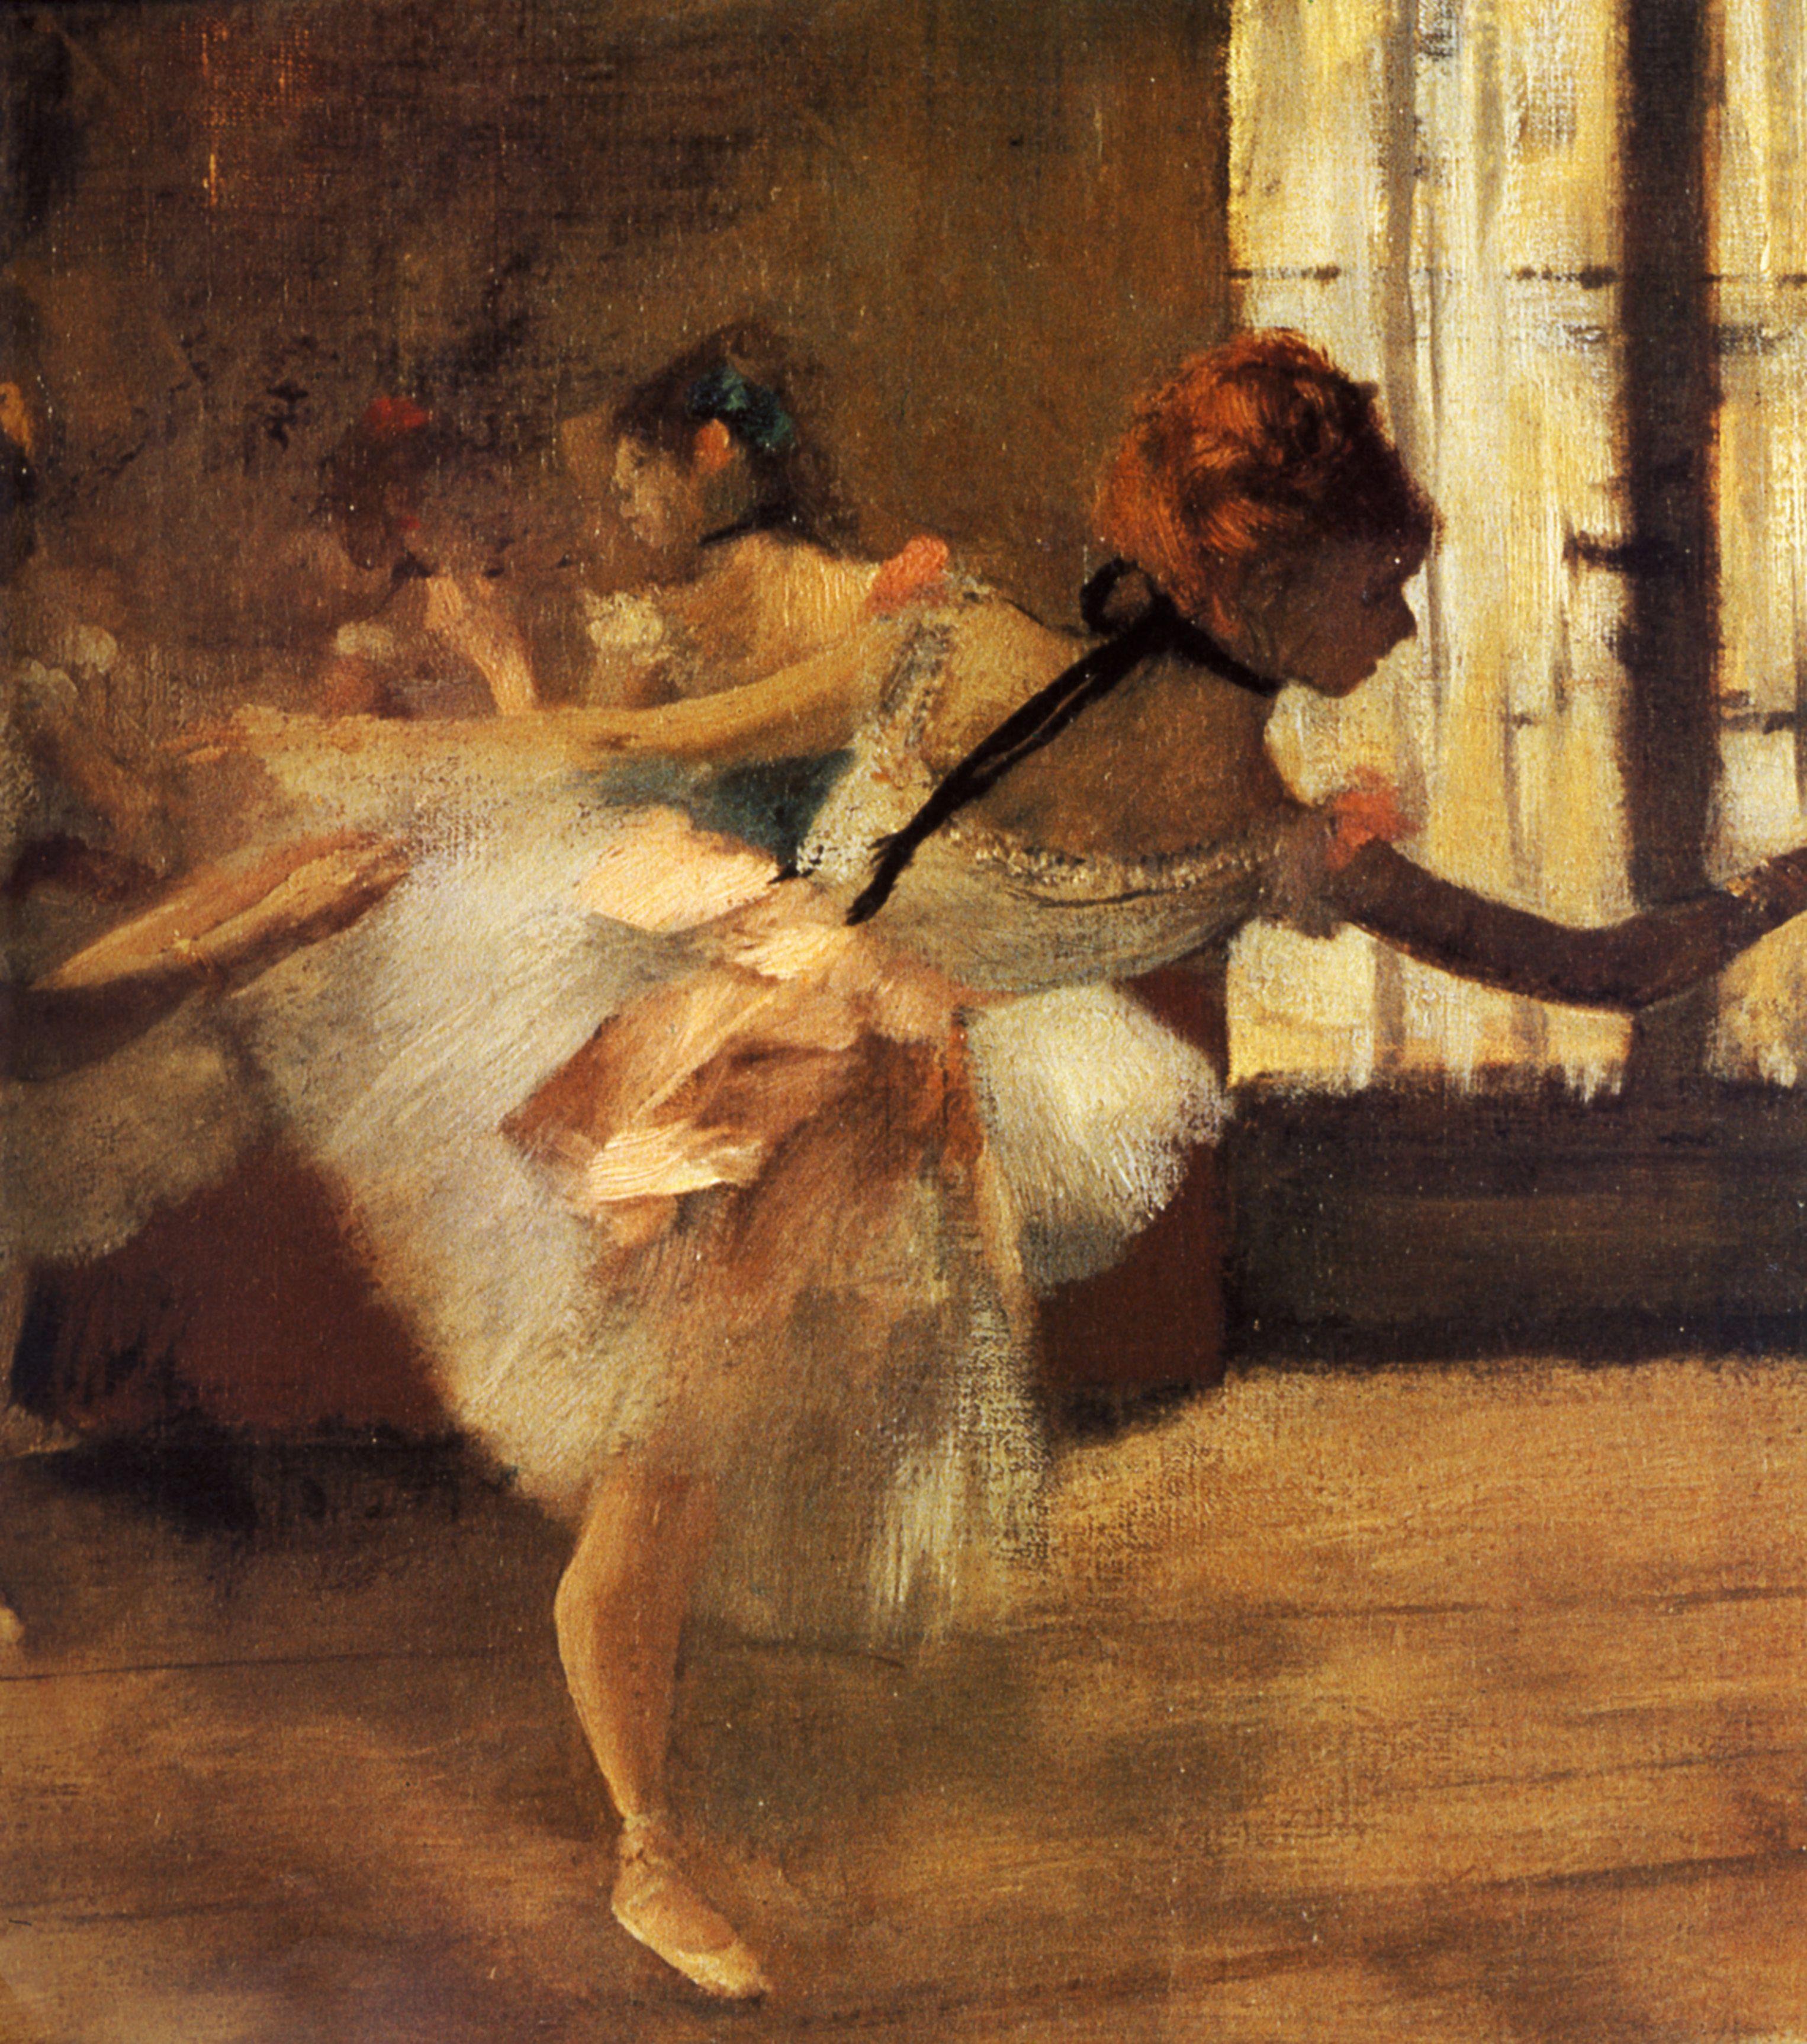 Another One Of My Favorites By Edgar Degas Degas Paintings Edgar Degas Artist